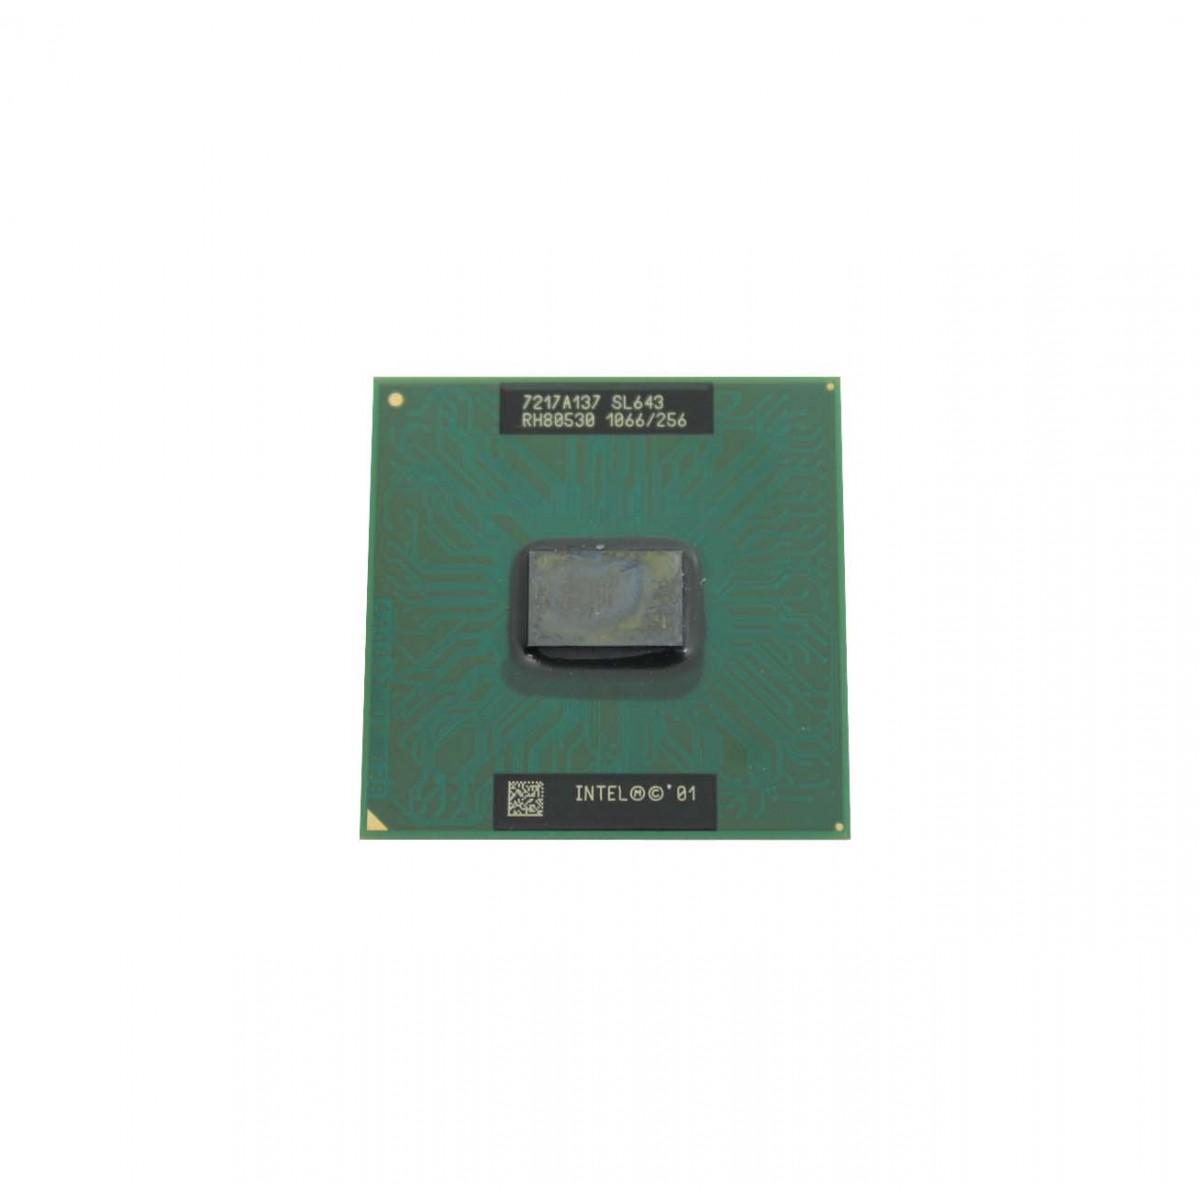 Processador Notebook Intel Celeron 1.06 GHz, 256K Cache, 133 MHz SL643